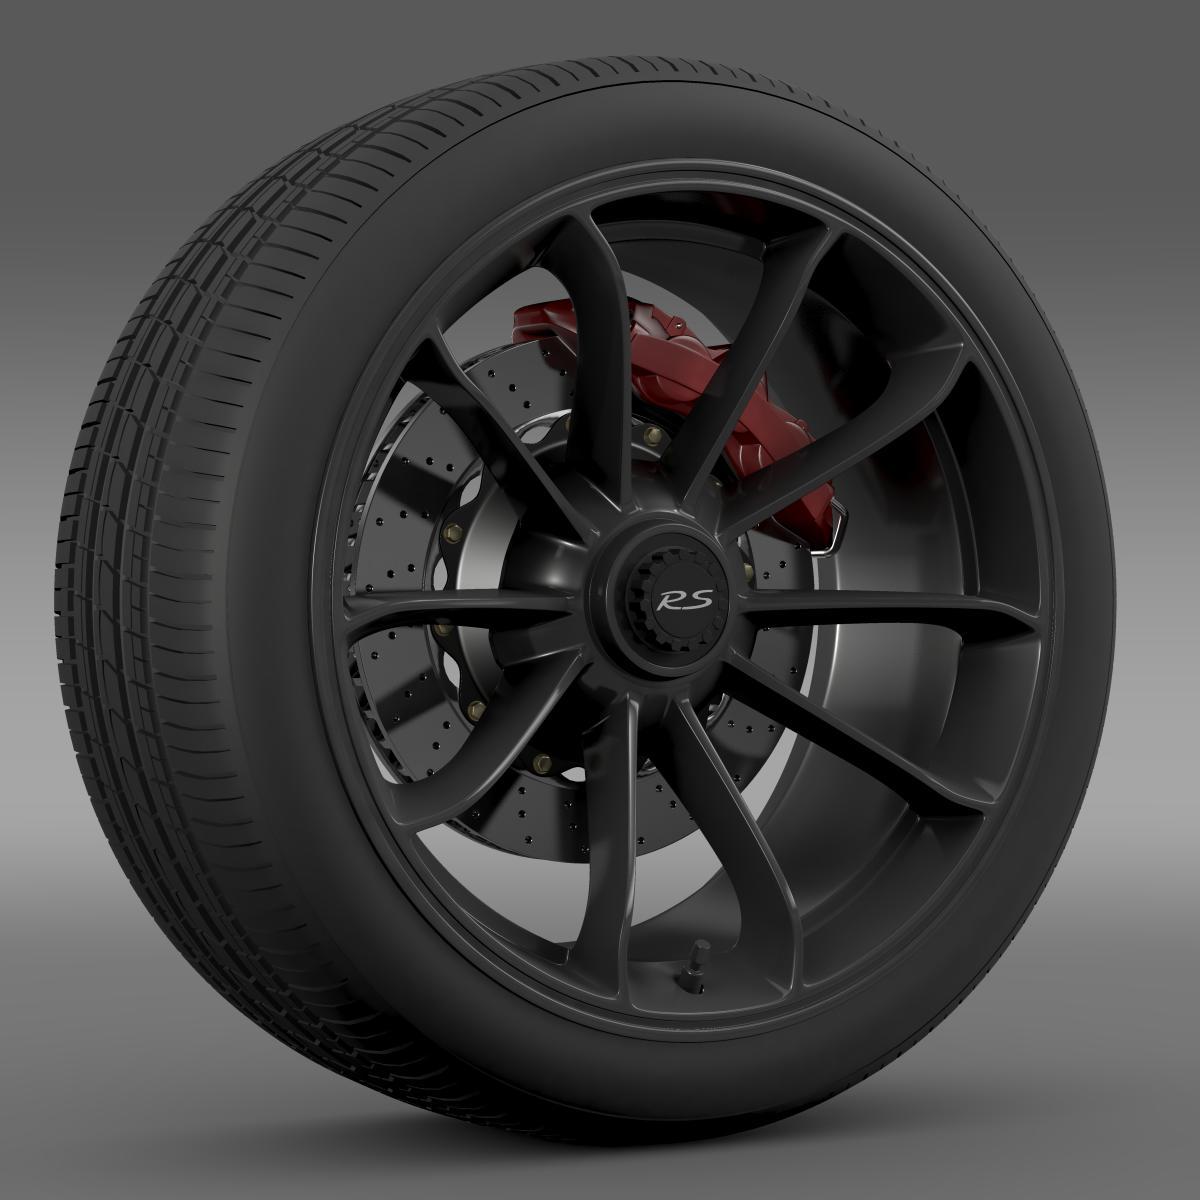 porsche 911 gt3 rs 2015 wheel 3d model 3ds max fbx c4d lwo ma mb hrc xsi obj 210830